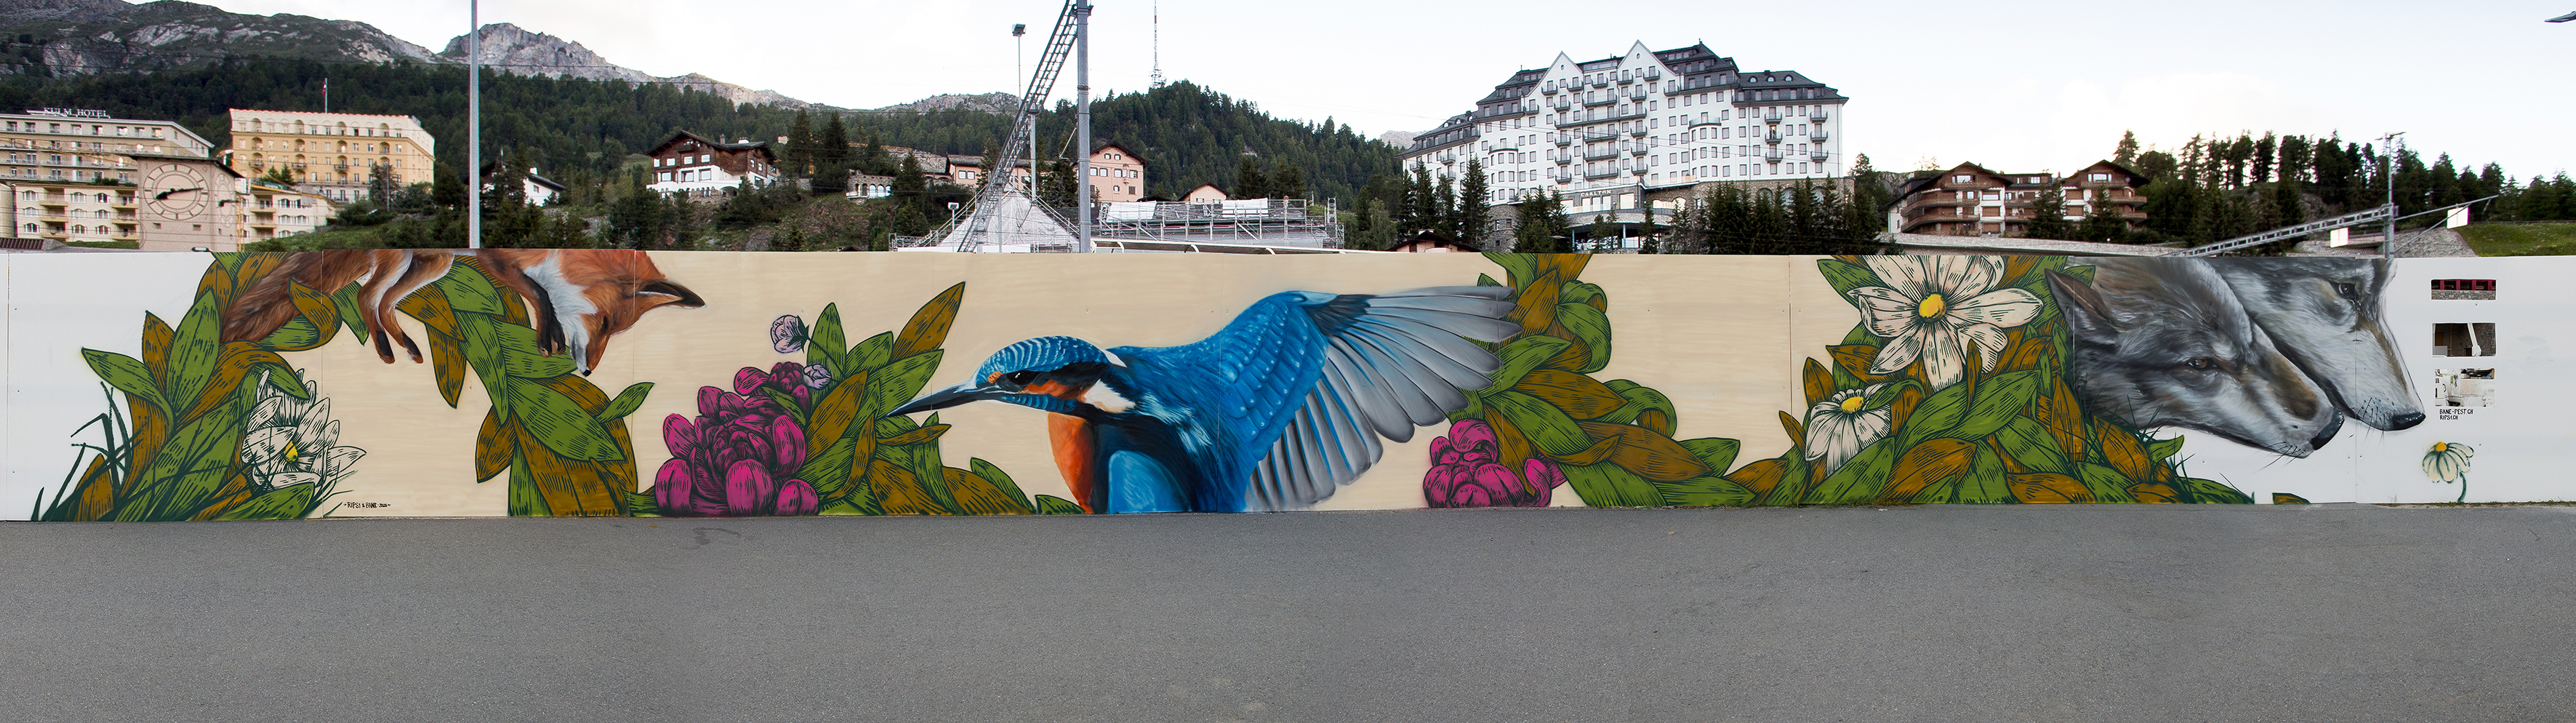 Natur in St-Moritz